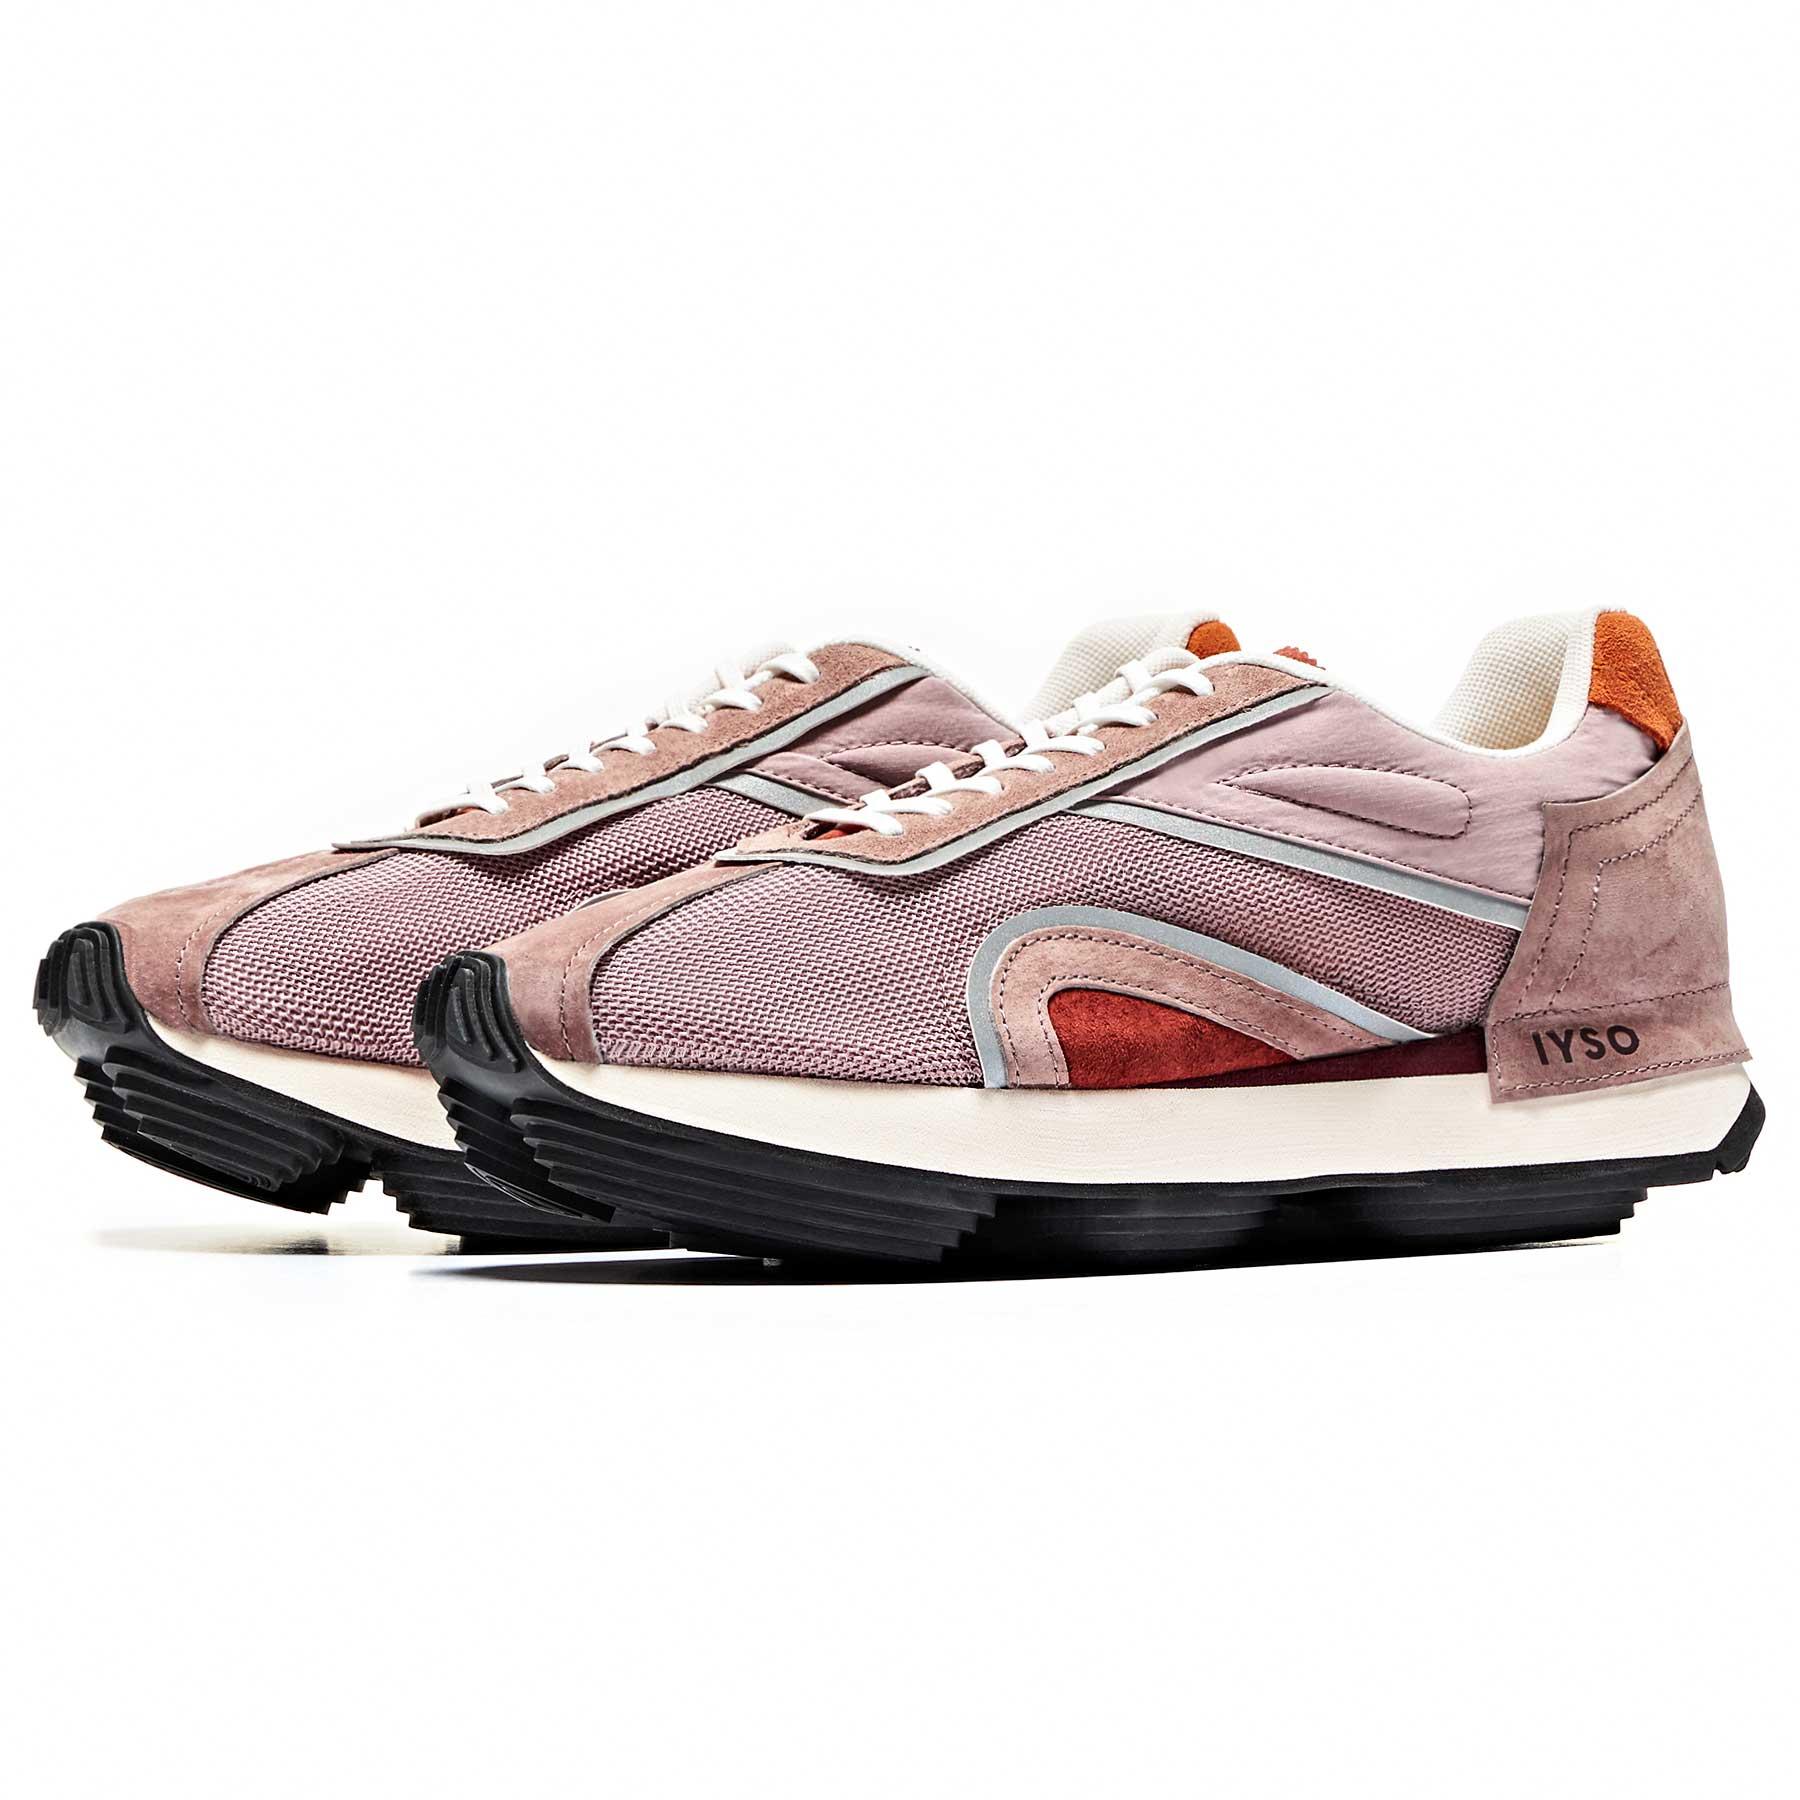 V2 HALO Space Pink